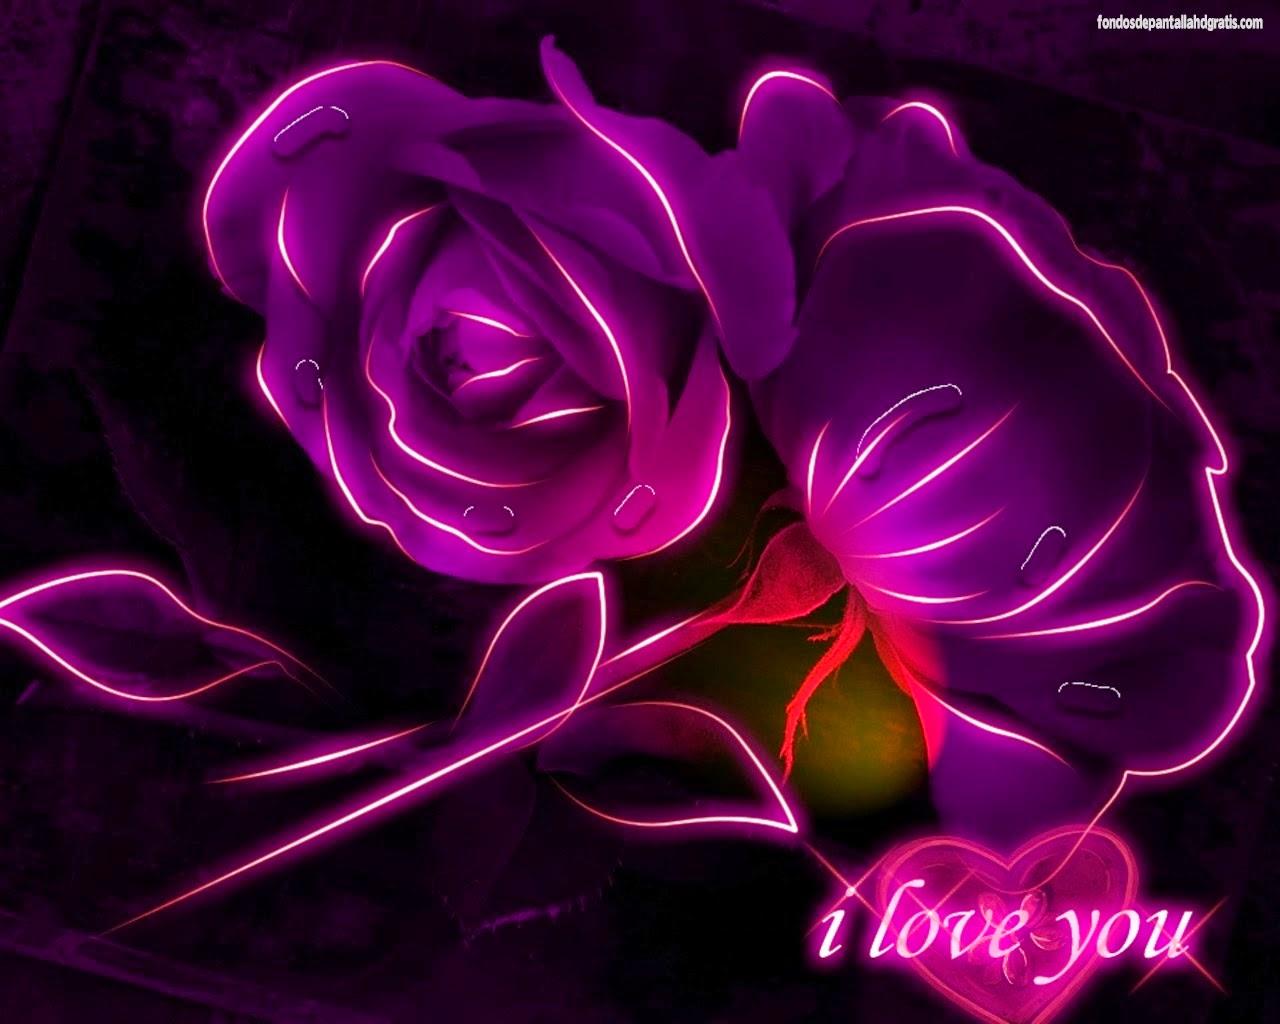 Rosas con brillo-flores para relagar-hermosas-animadas-tiernas-encantadoras